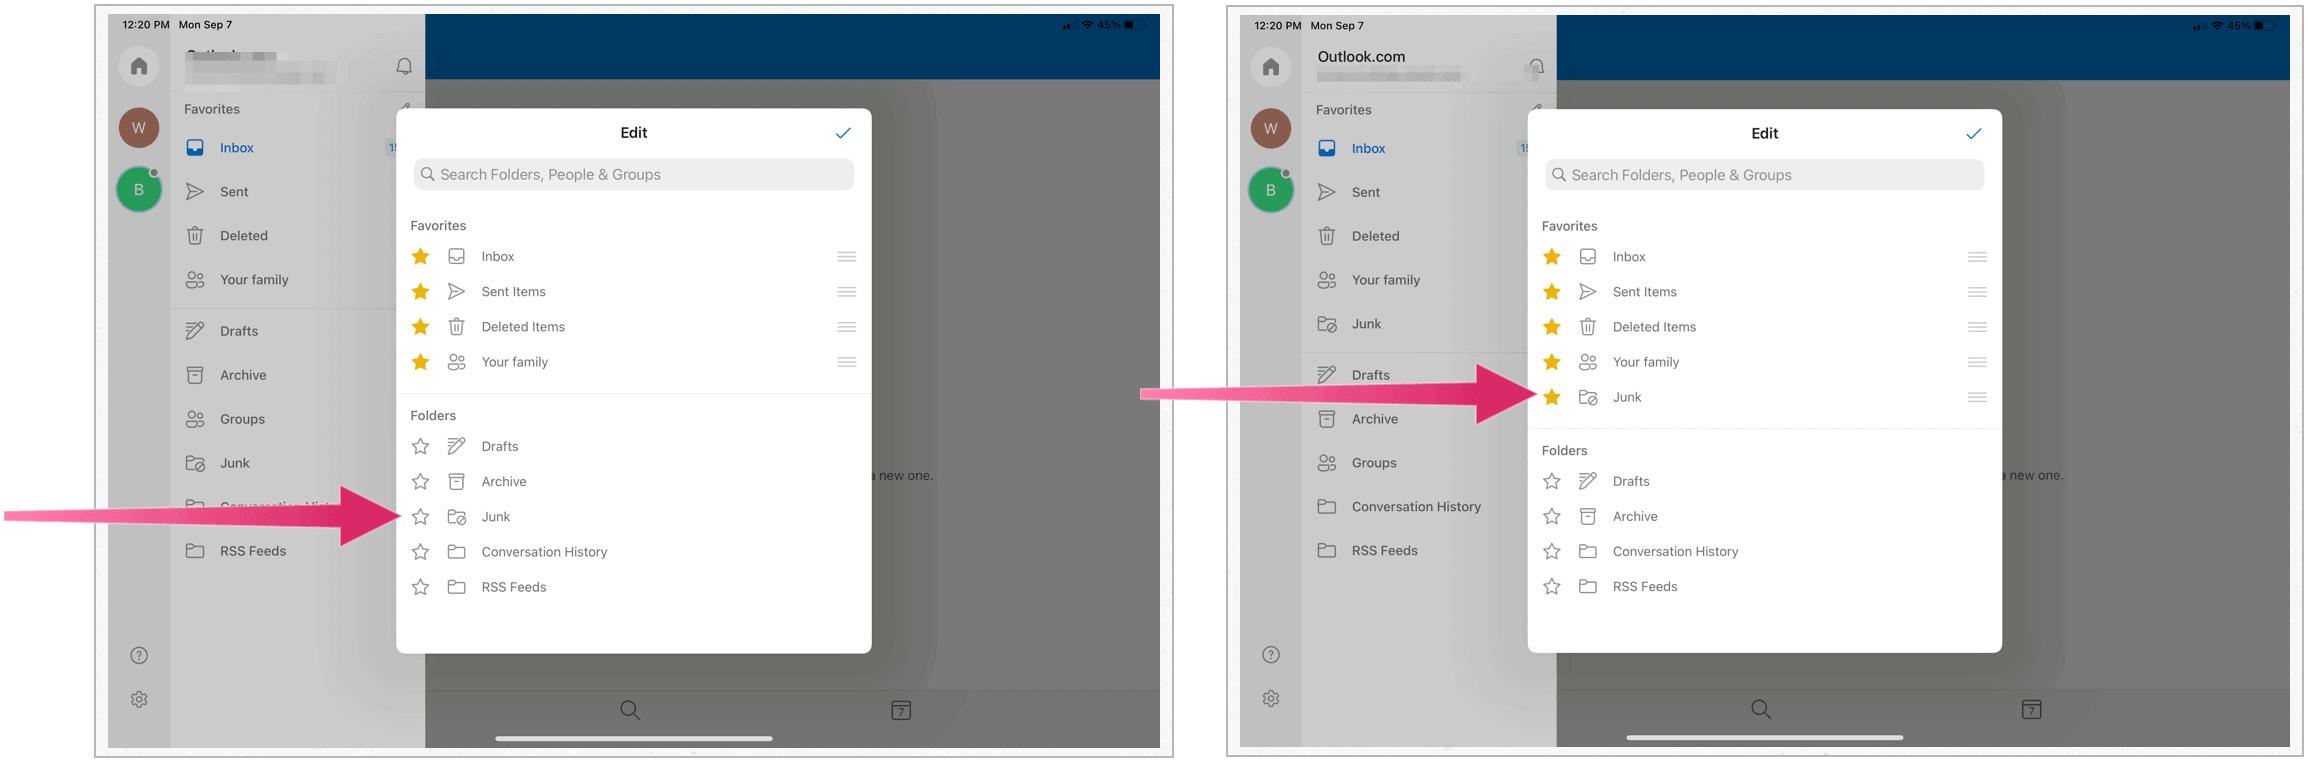 Microsoft Outlook on iPad, favorite folders